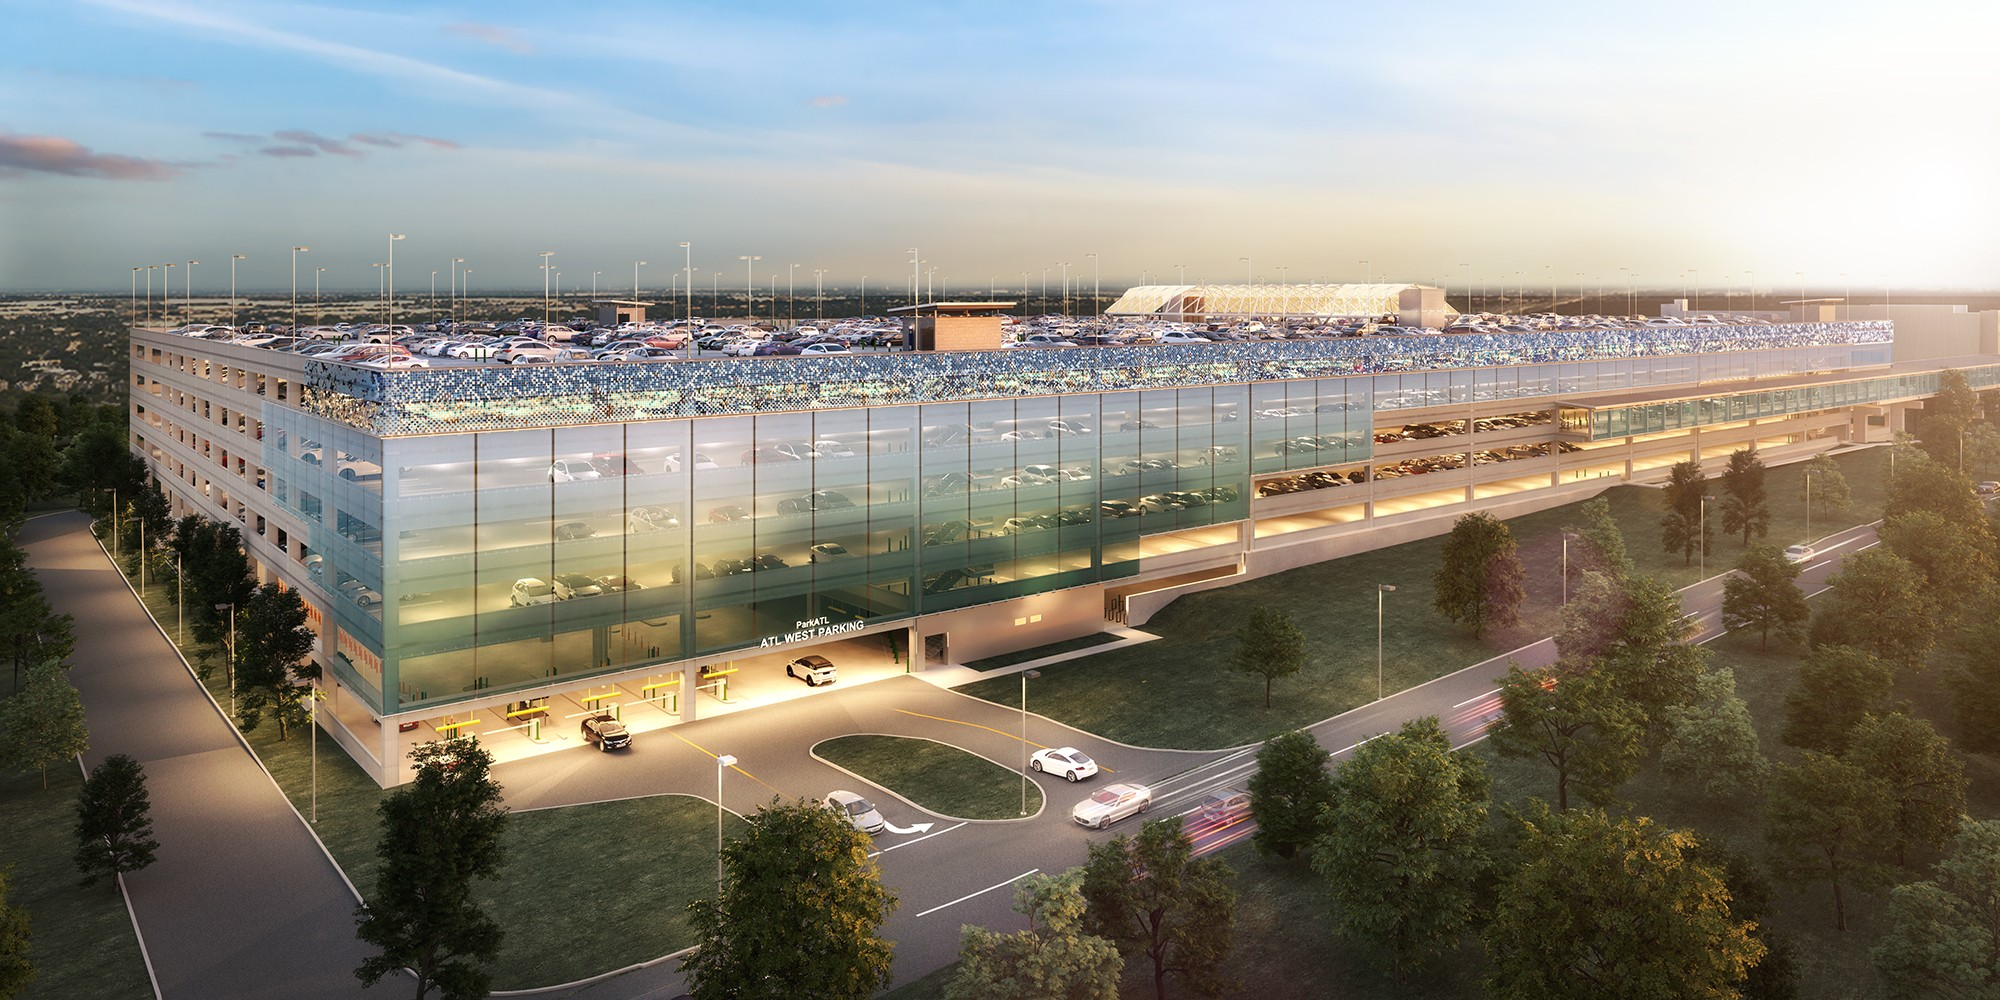 Hartsfield-Jackson Atlanta International Airport West Economy Parking Lot Water Relocation